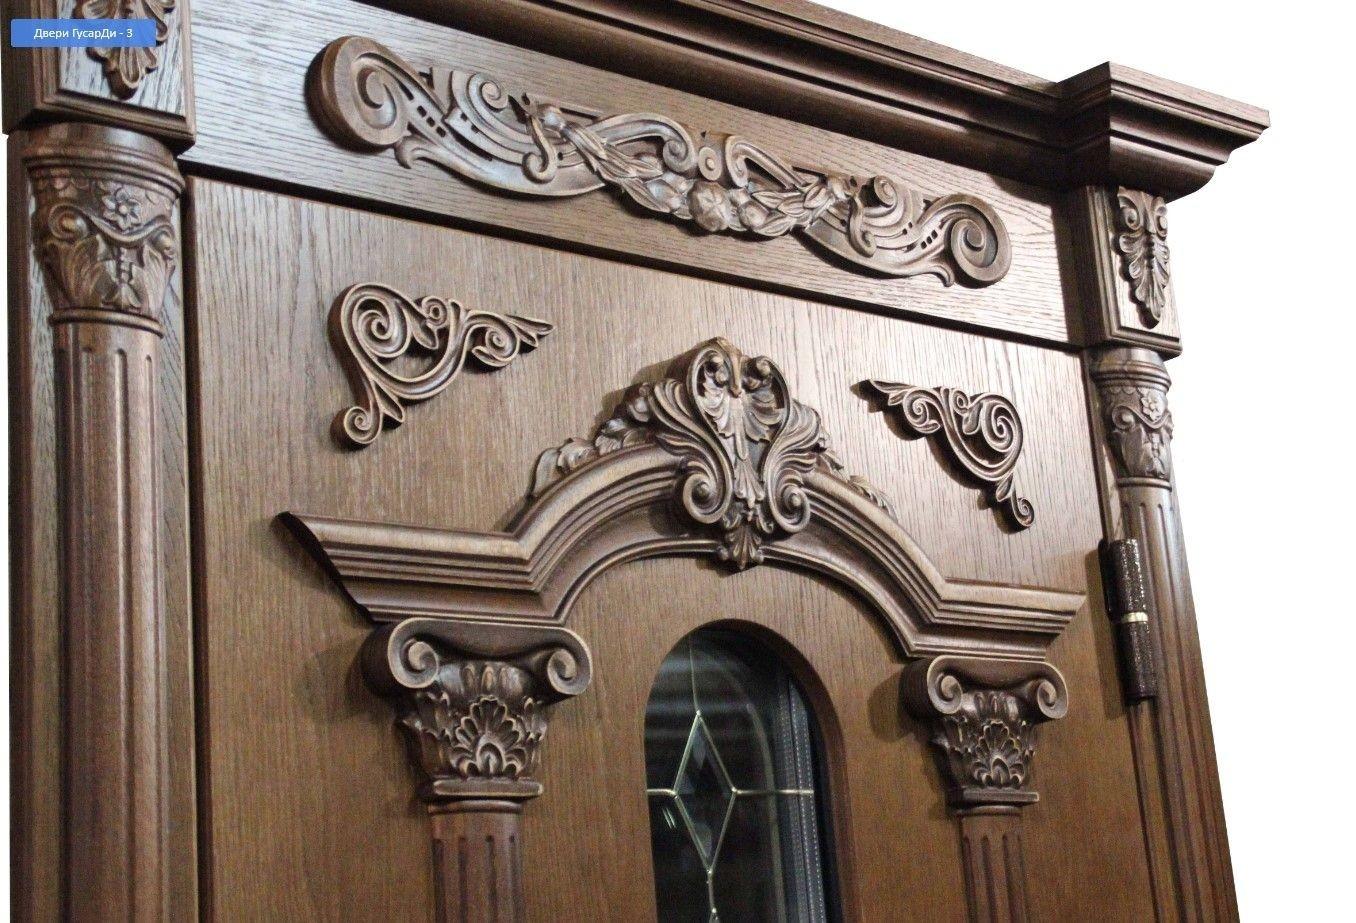 gusardi1 - Металлодеревянные двери